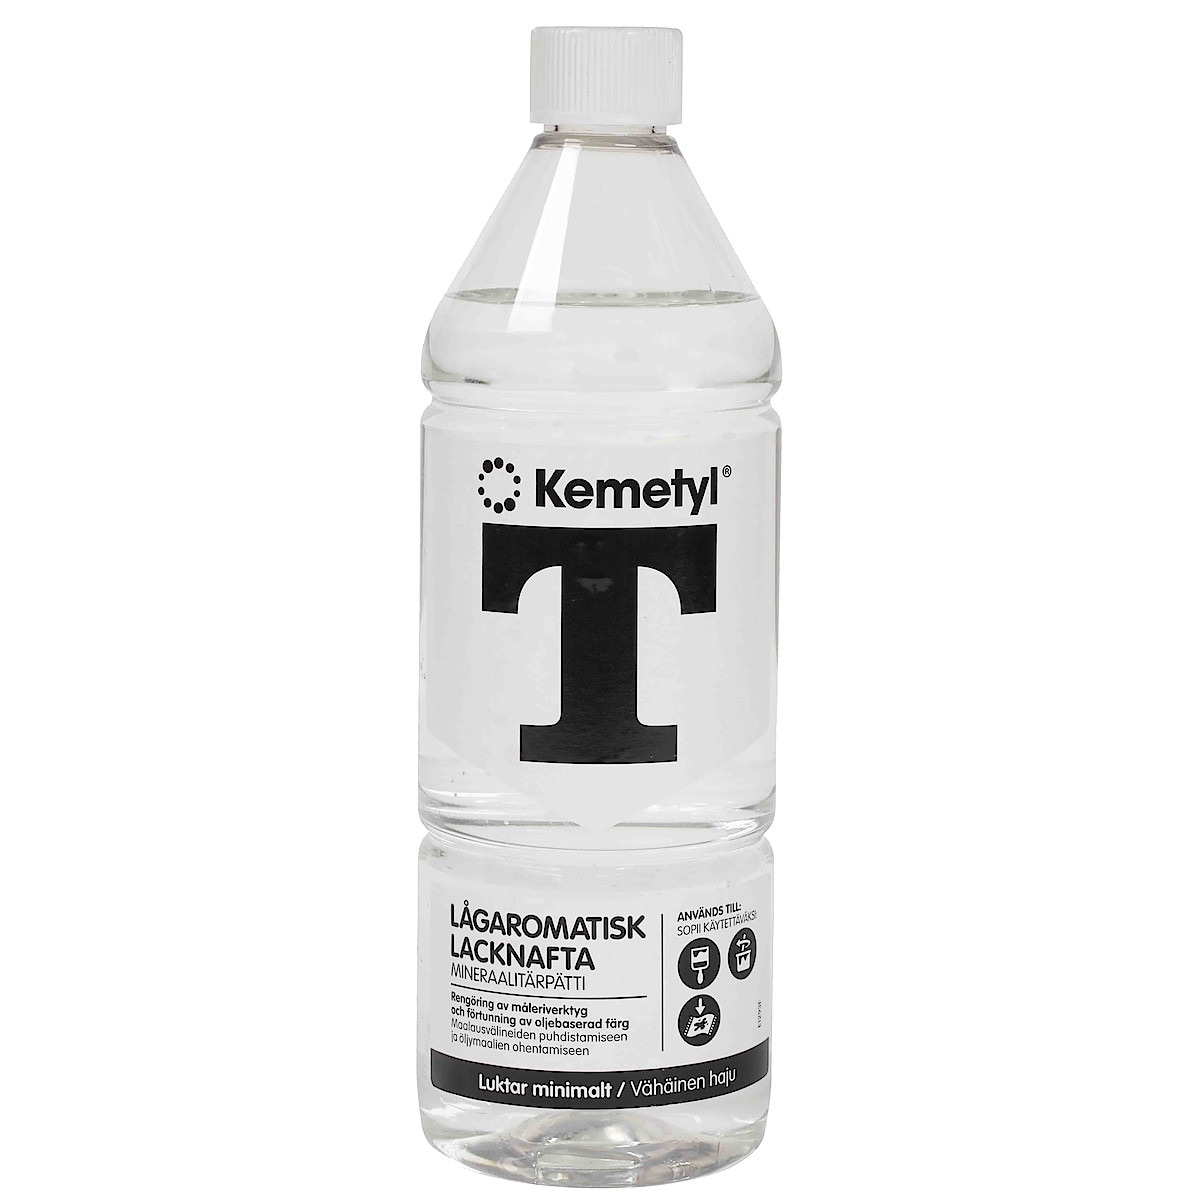 Kemetyl lakknafta (white spirit)